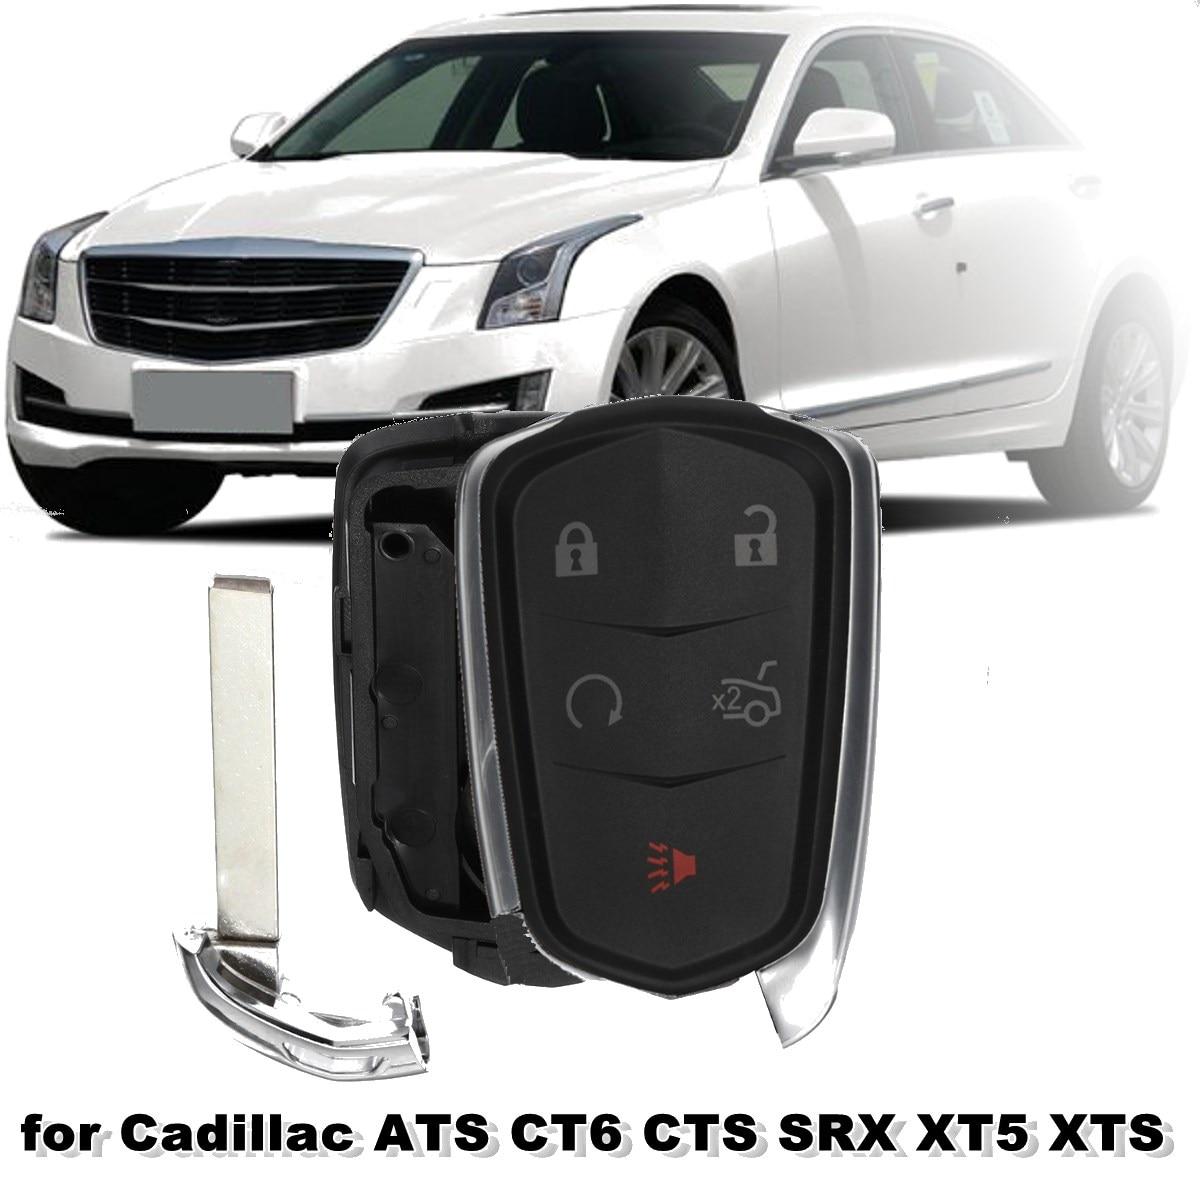 # HYQ2AB # HYQ2EB # 1511A-2B # 1511A-2EB 5 botones mando a distancia carcasa Fob para Cadillac ATS CT6 CTS SRX XT5 XTS 2014 2015 2016